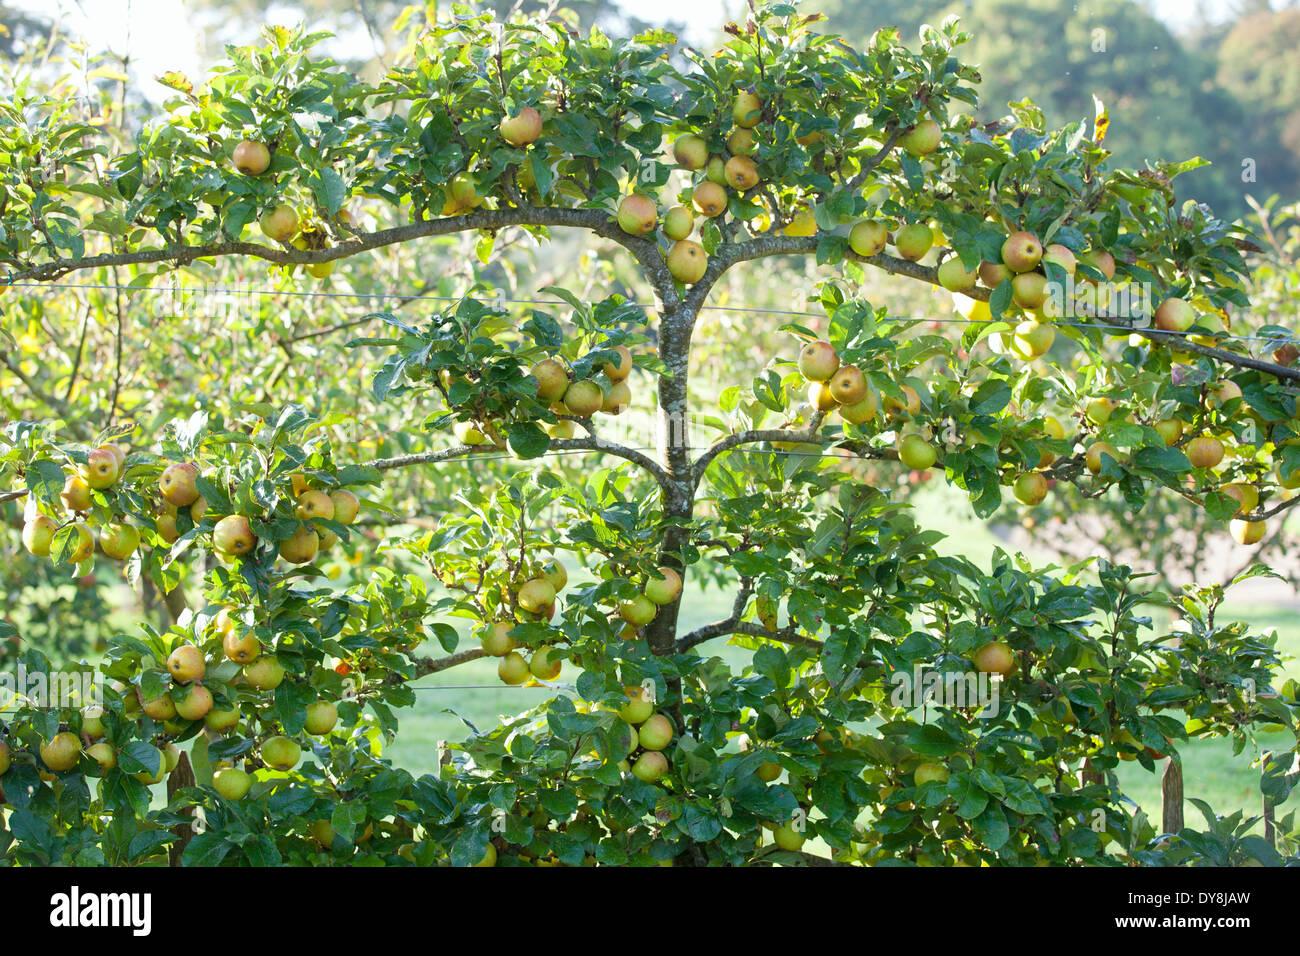 Malus Rosemary Russet, Apple. September, Autumn. Espaliered apple tree bearing fruit. - Stock Image